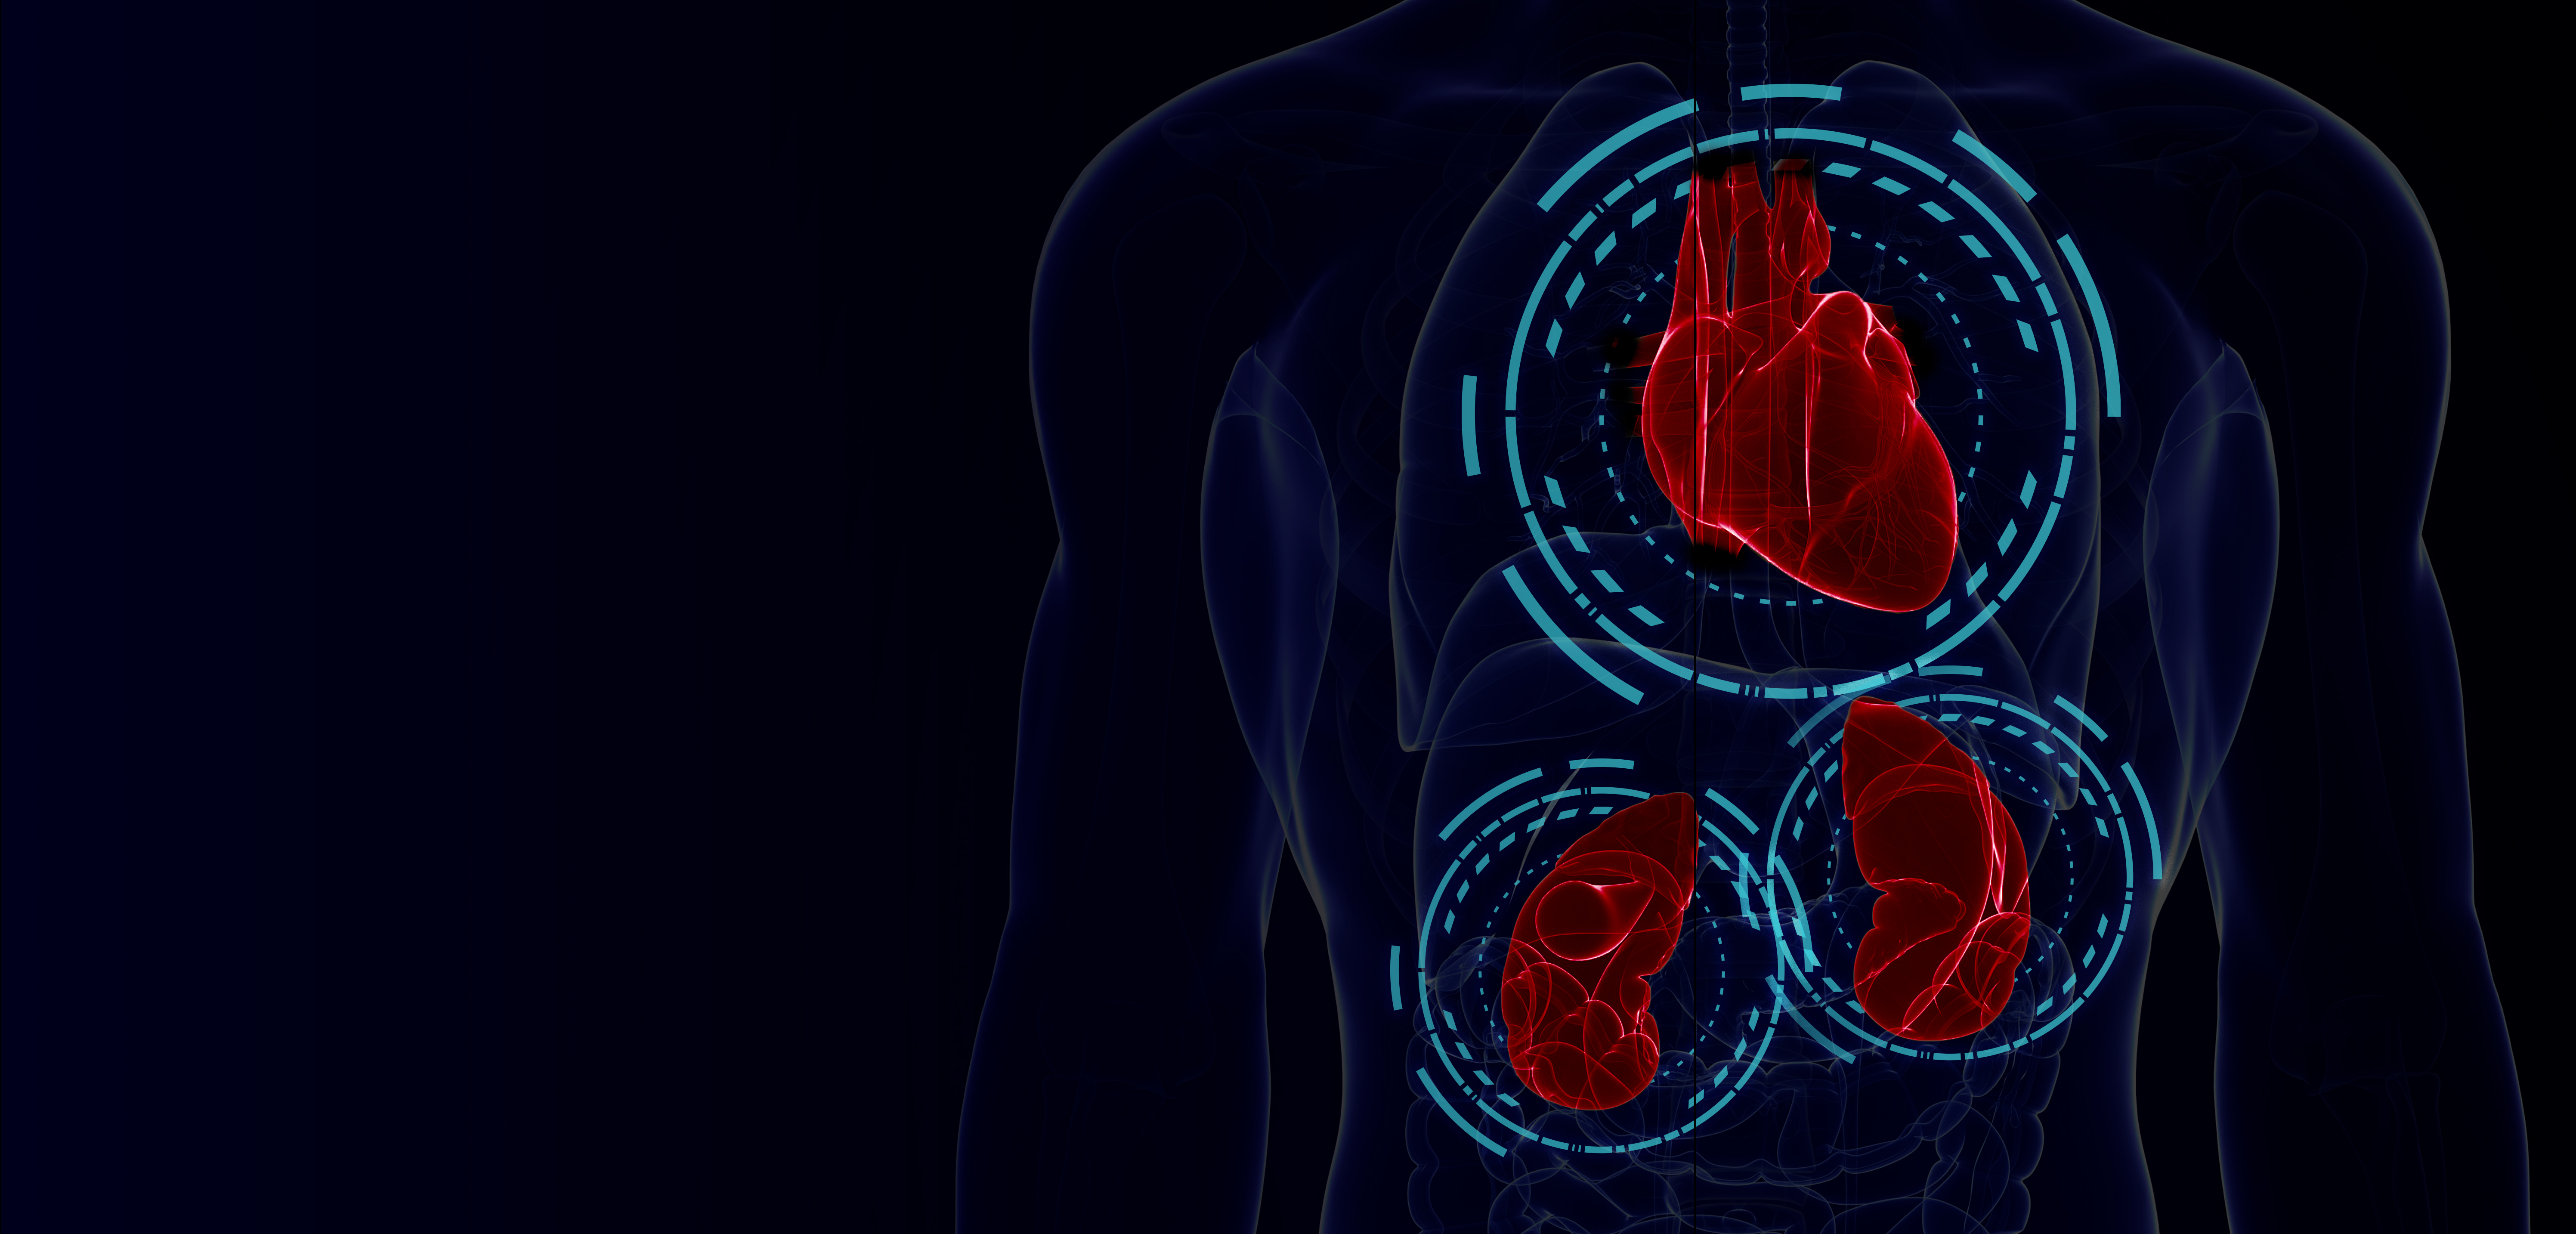 Addressing Clinical Inertia in CKD & Heart Failure Management